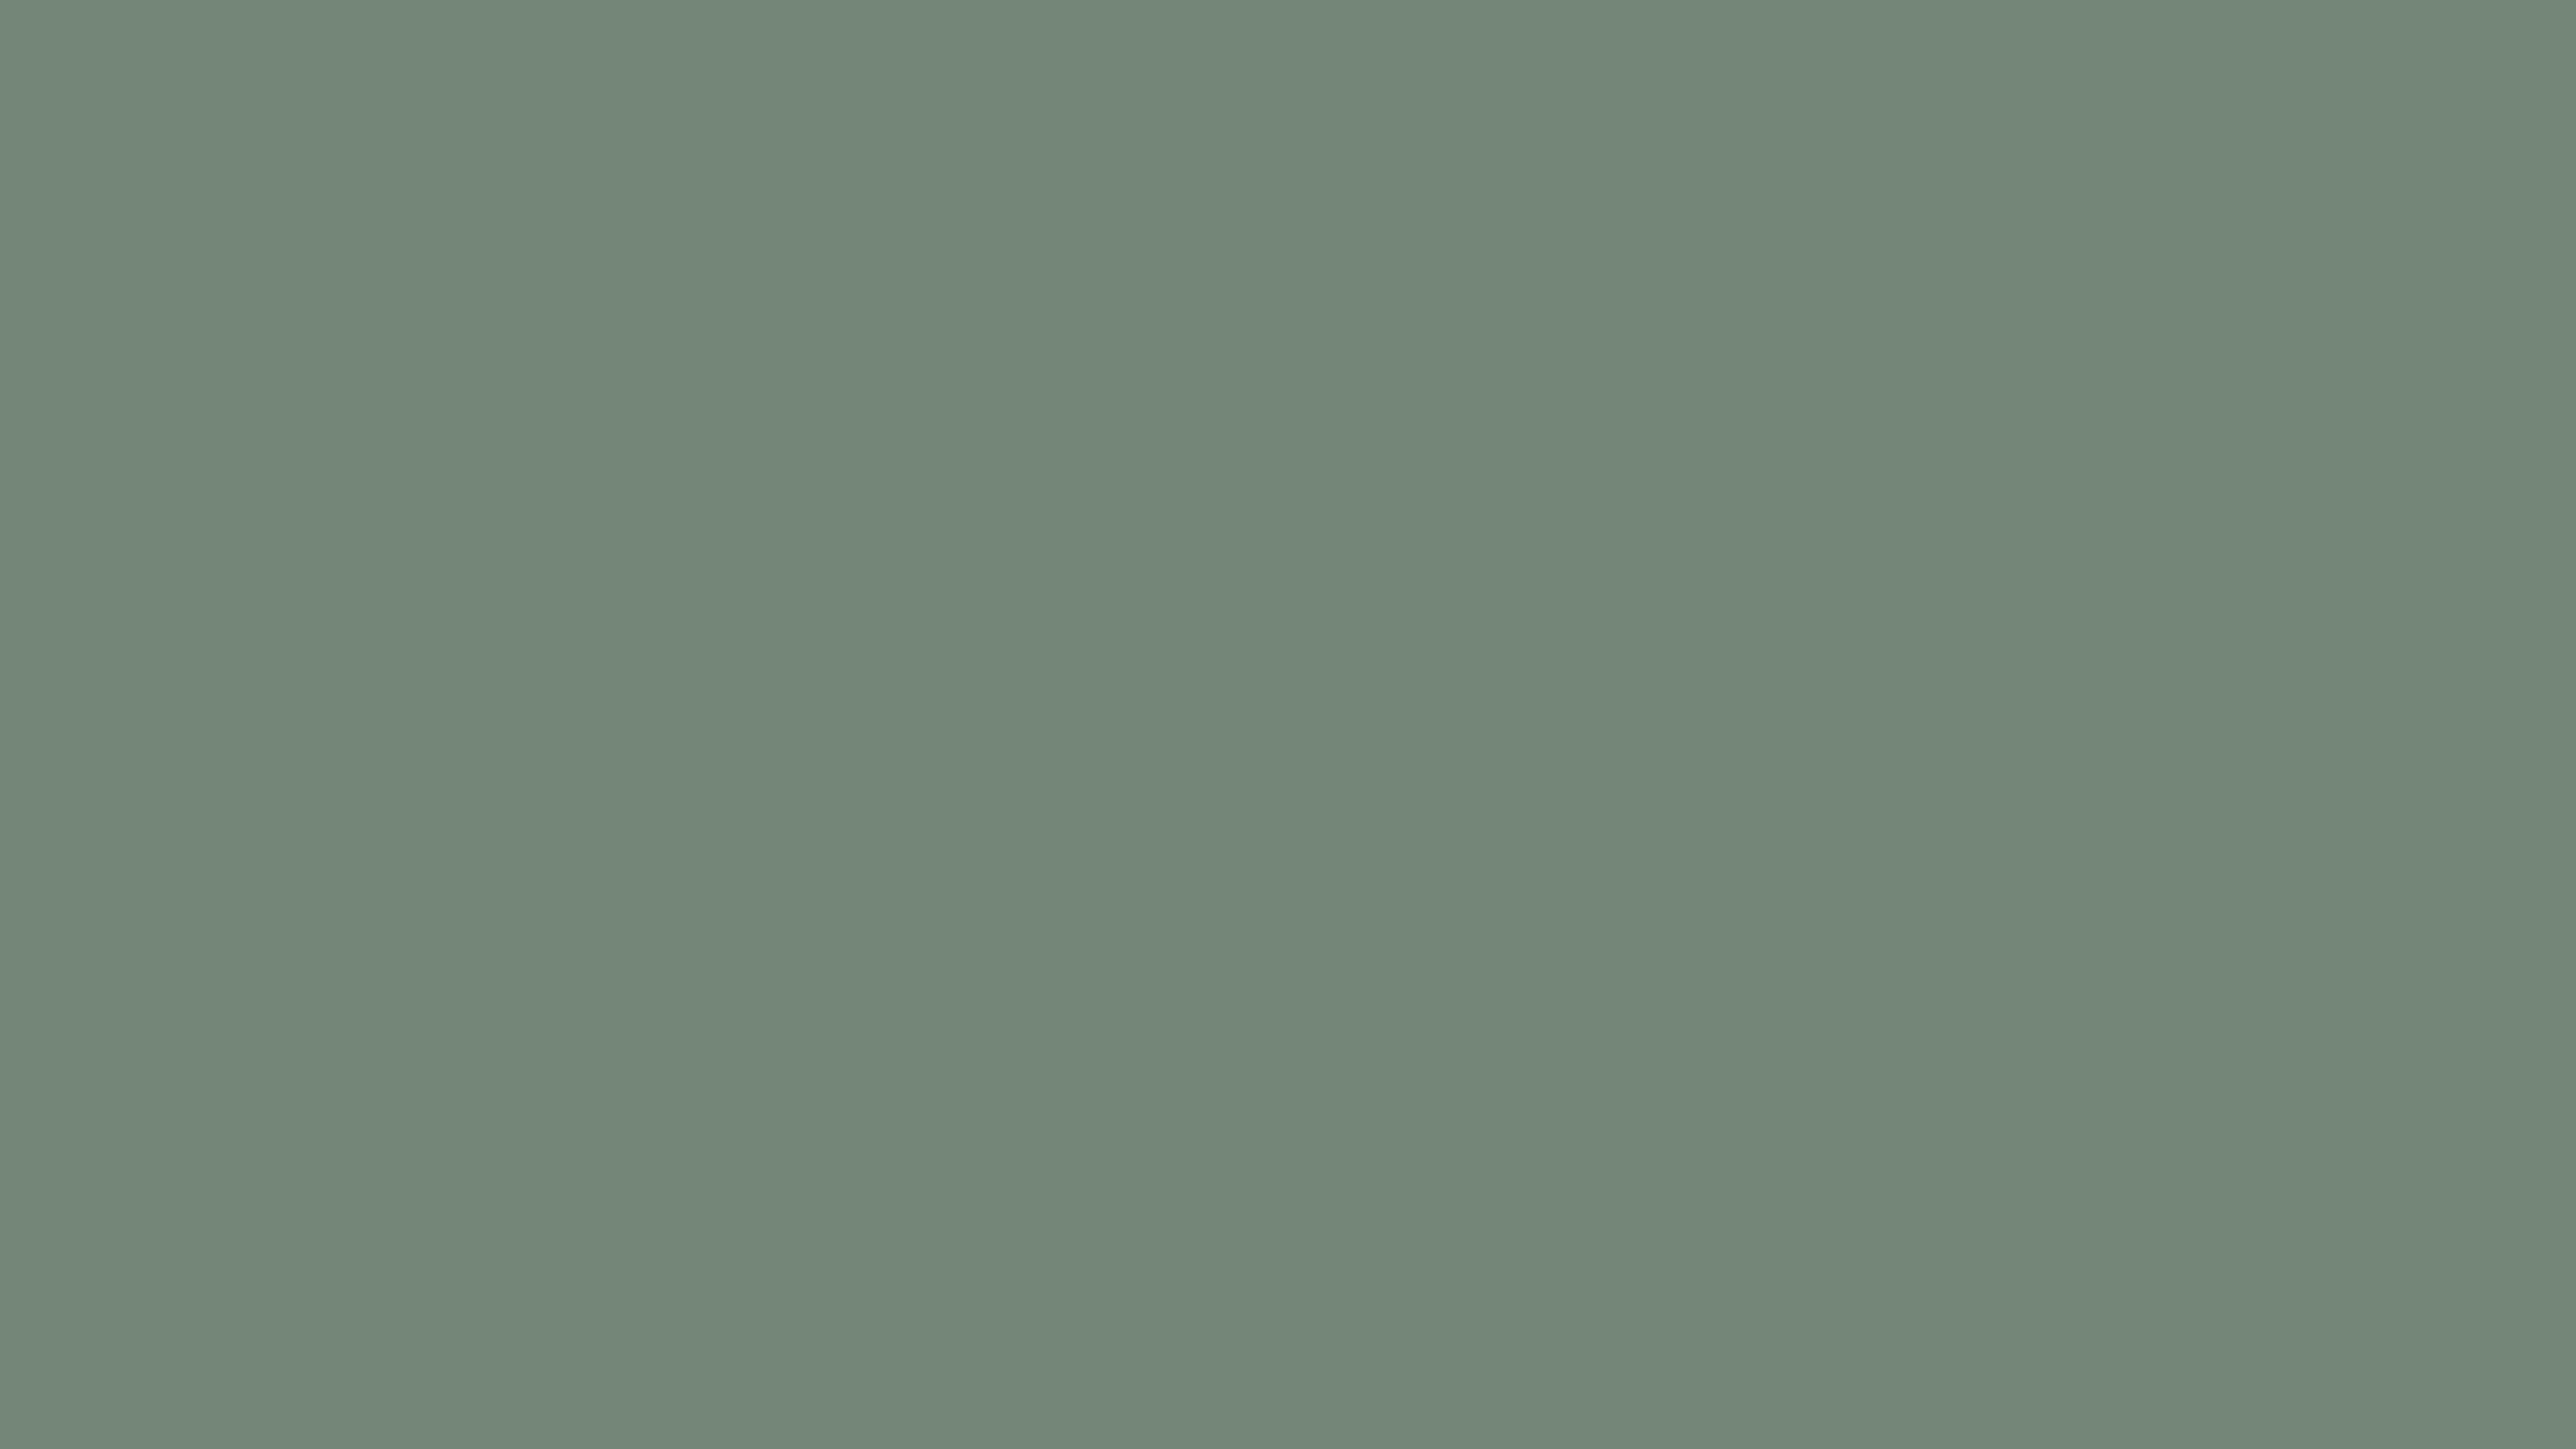 7680x4320 Xanadu Solid Color Background